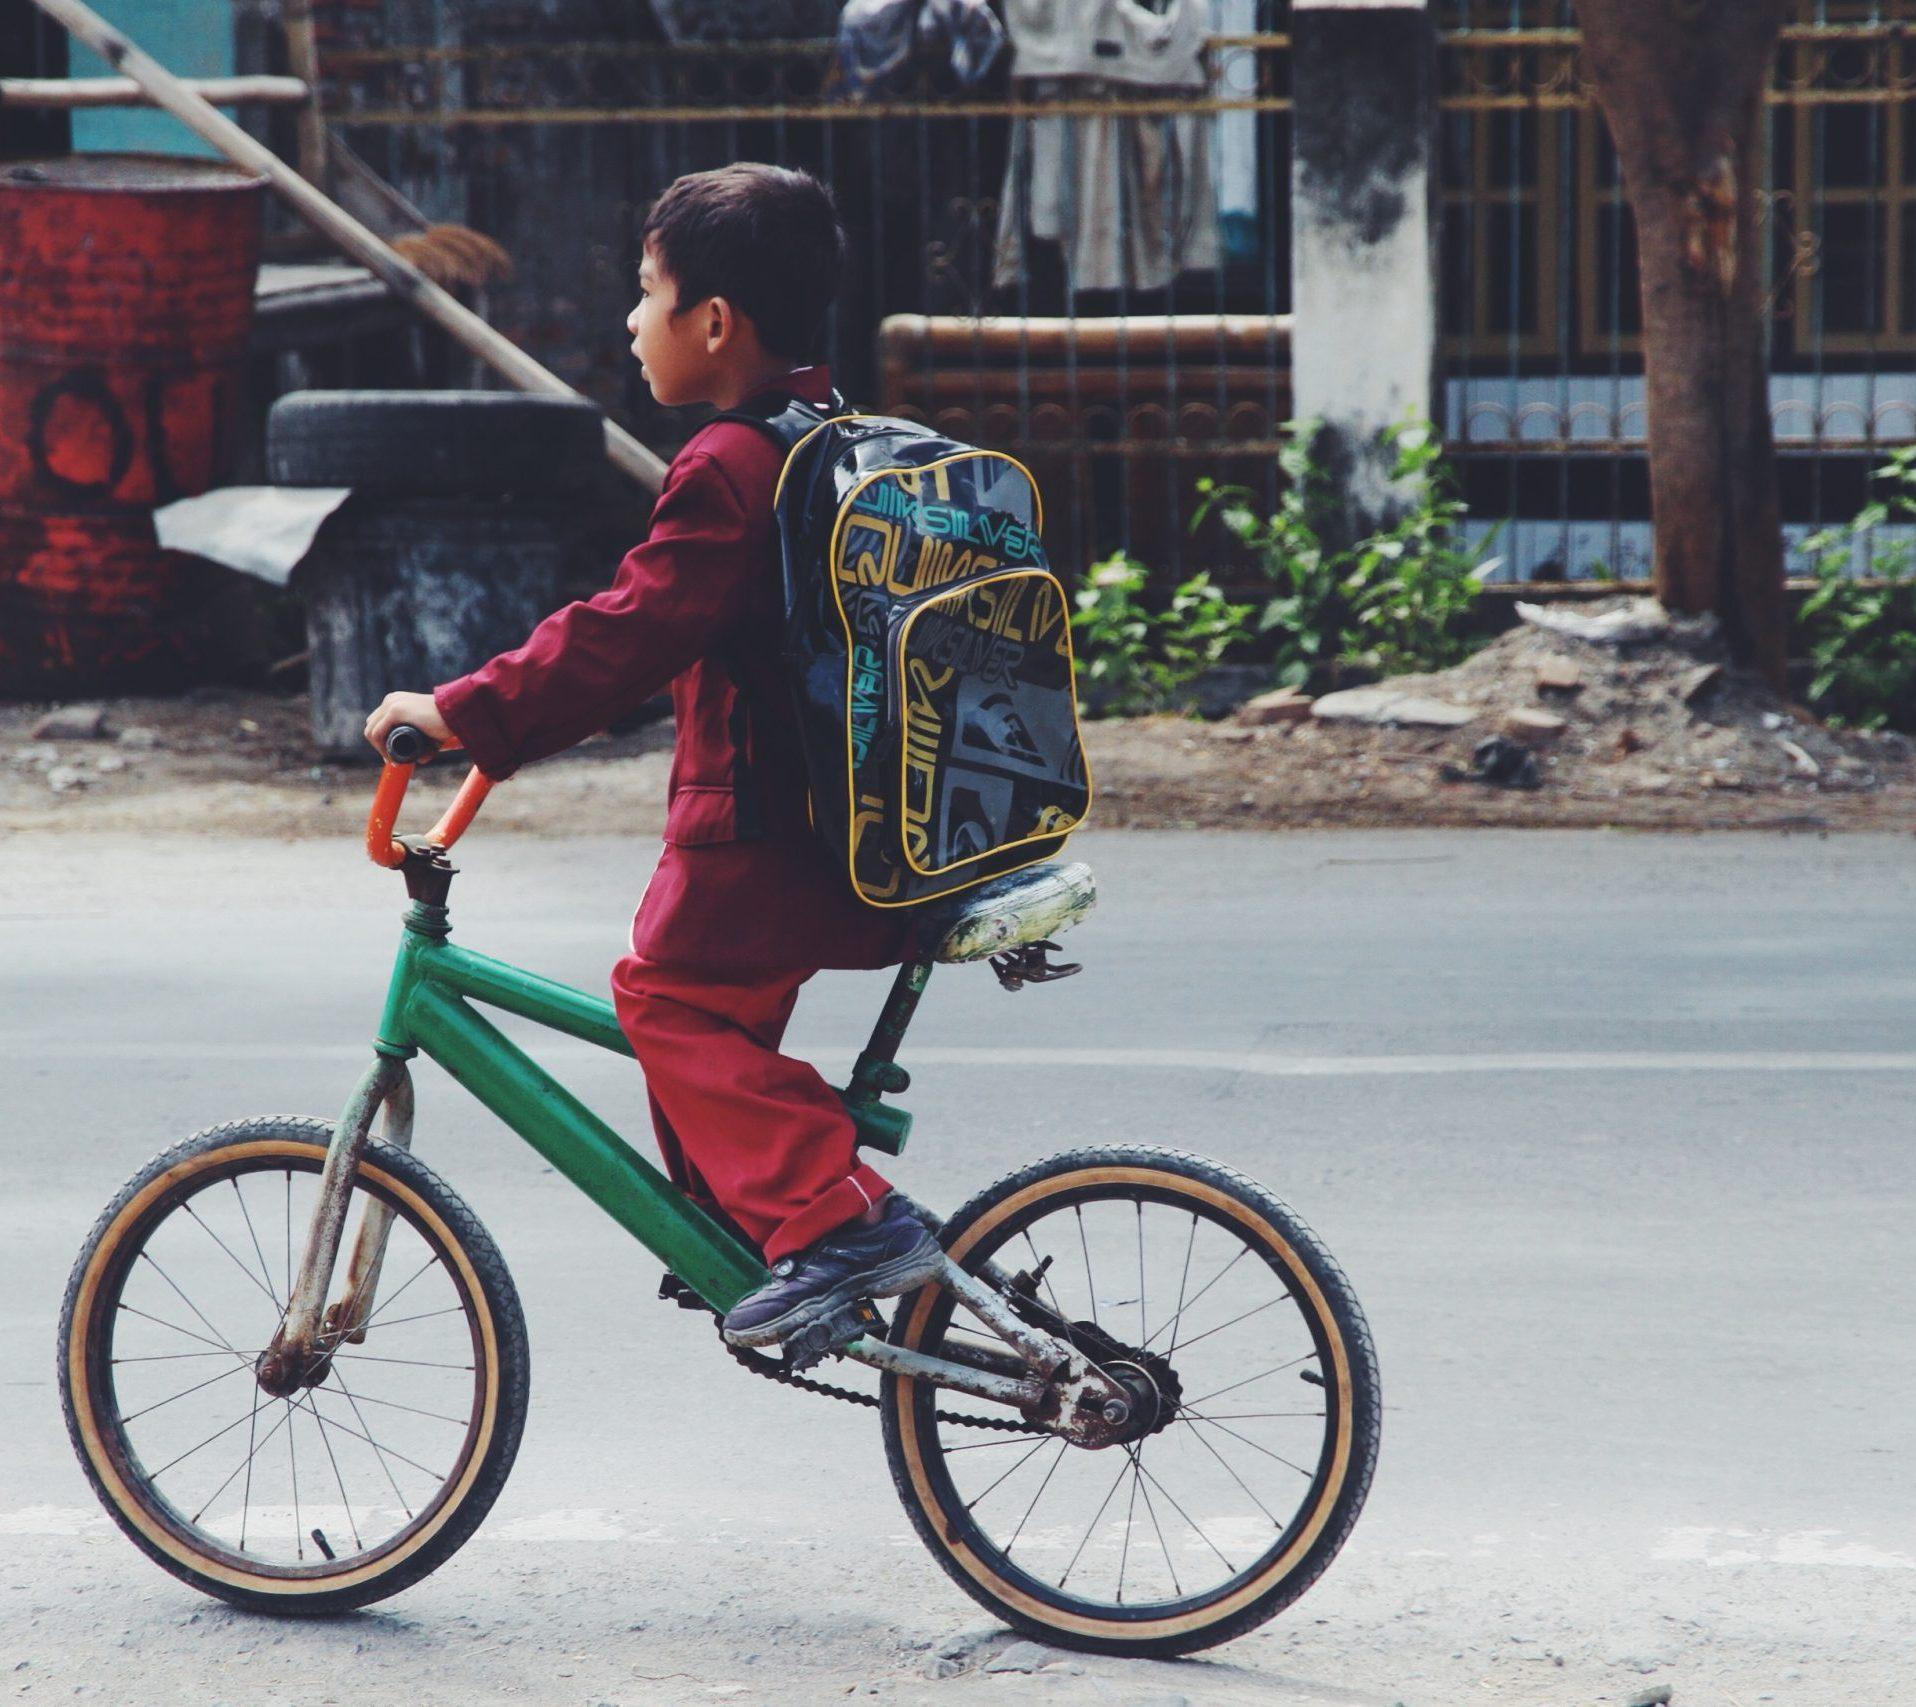 Local child on a bike